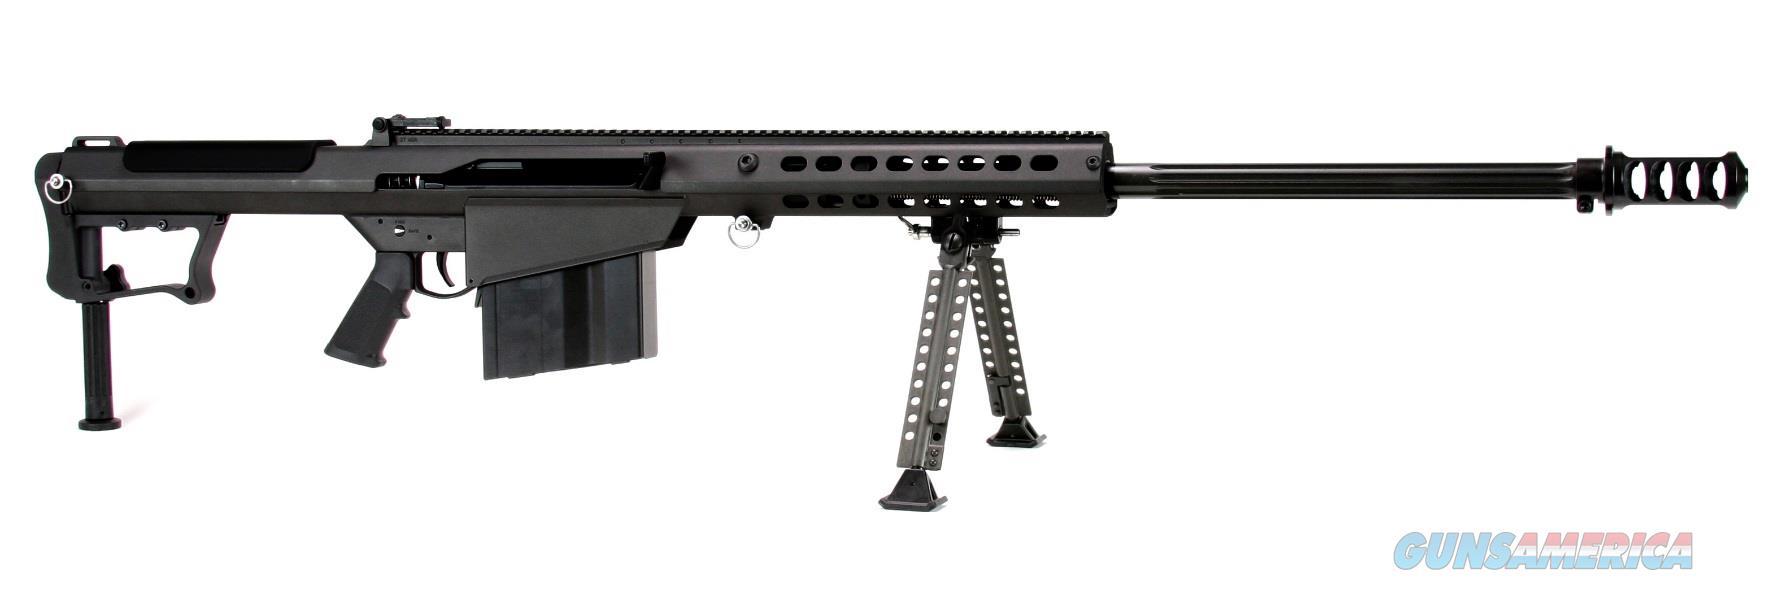 "M107a1 50Bmg Blk 29"" 10+1 14085  Guns > Rifles > Barrett Rifles"